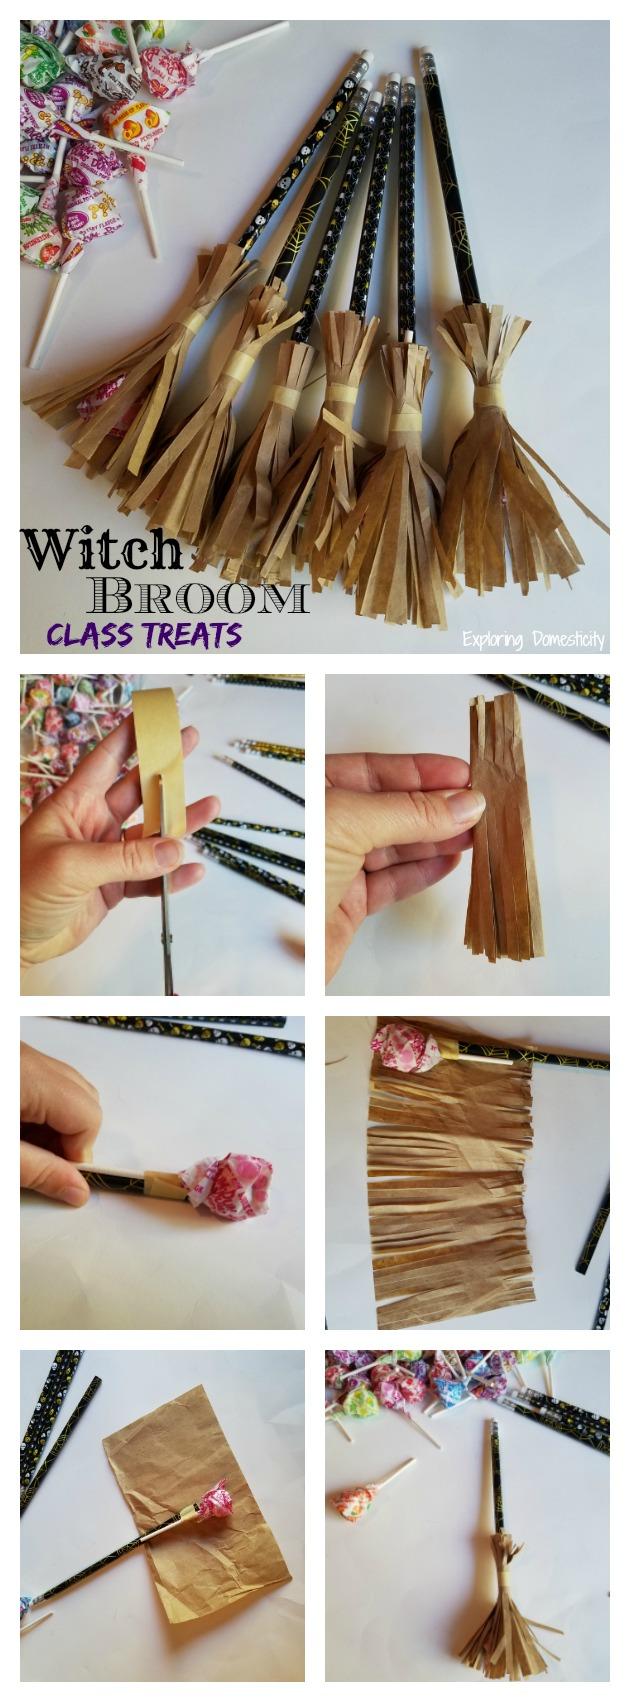 Witch Broom Halloween Class Treats ⋆ Exploring Domesticity